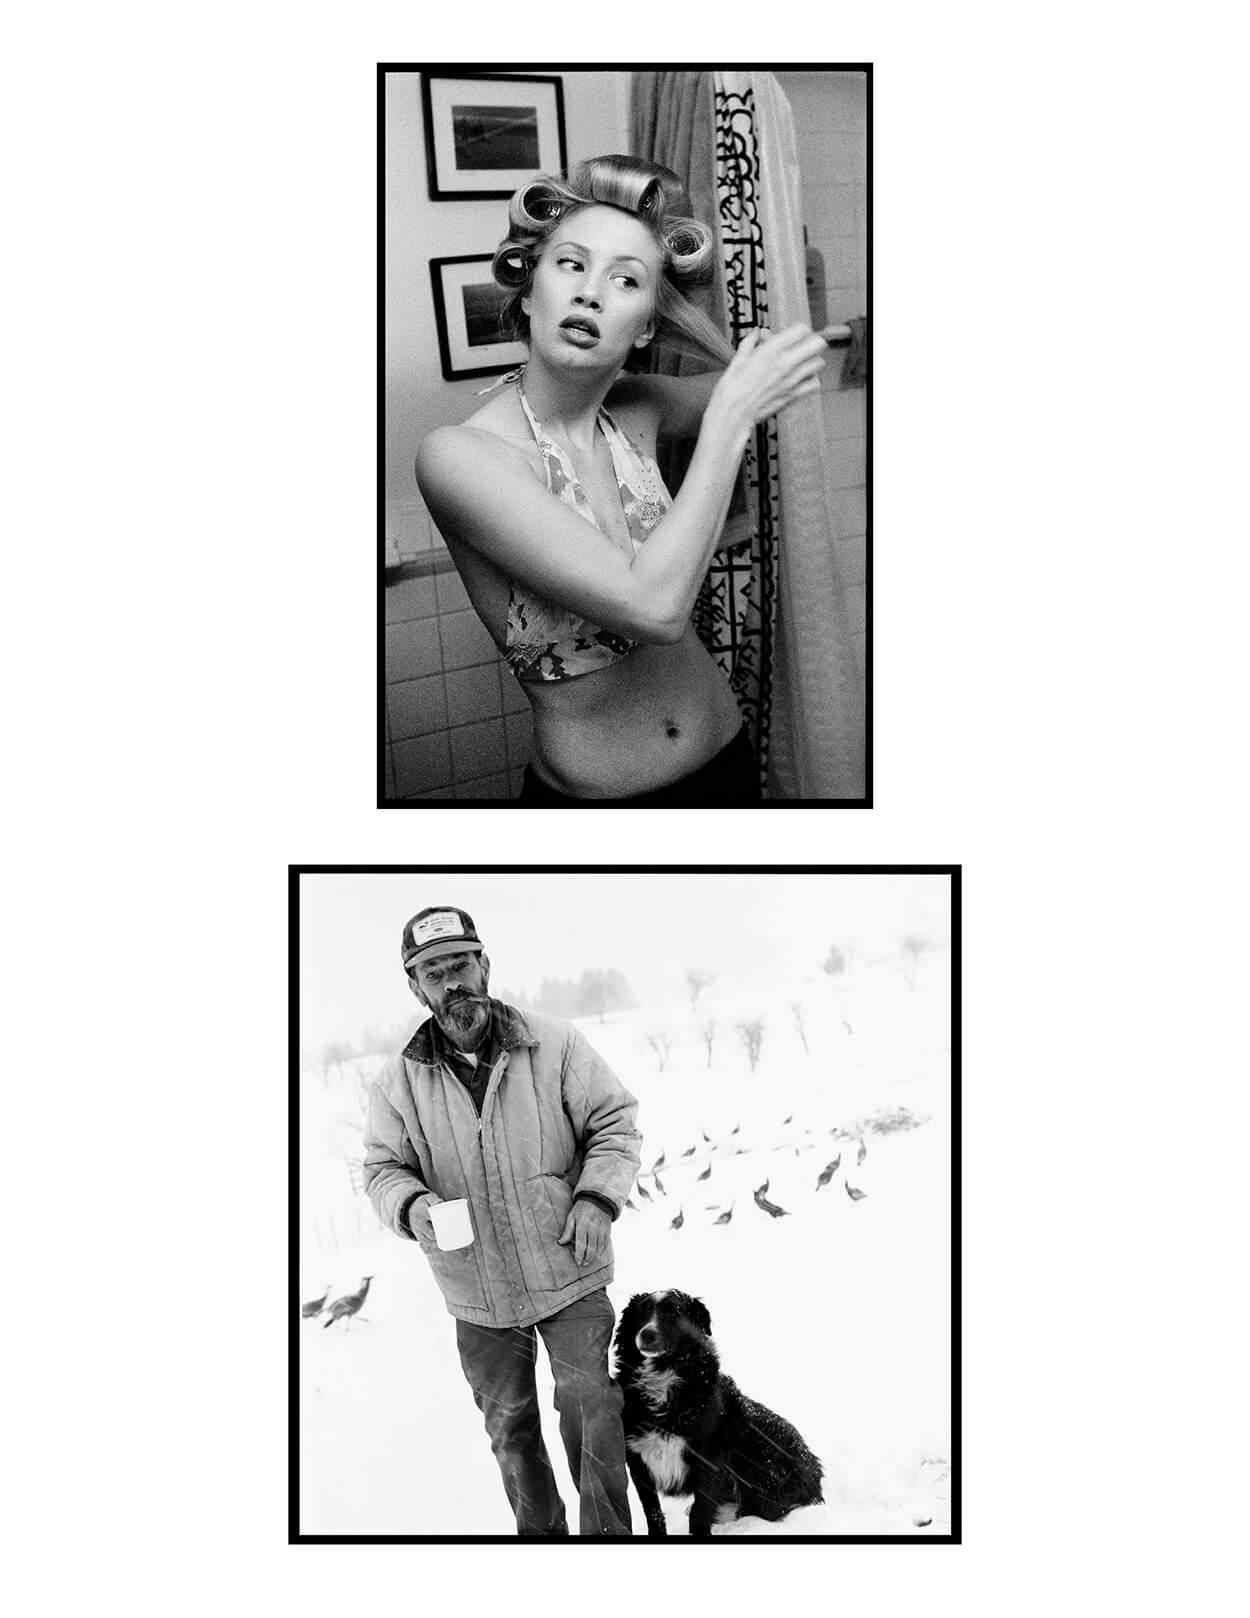 Hunter Barnes documents America's fringe communities in Roadbook - Popular Photography - Popular Photography - Page 9